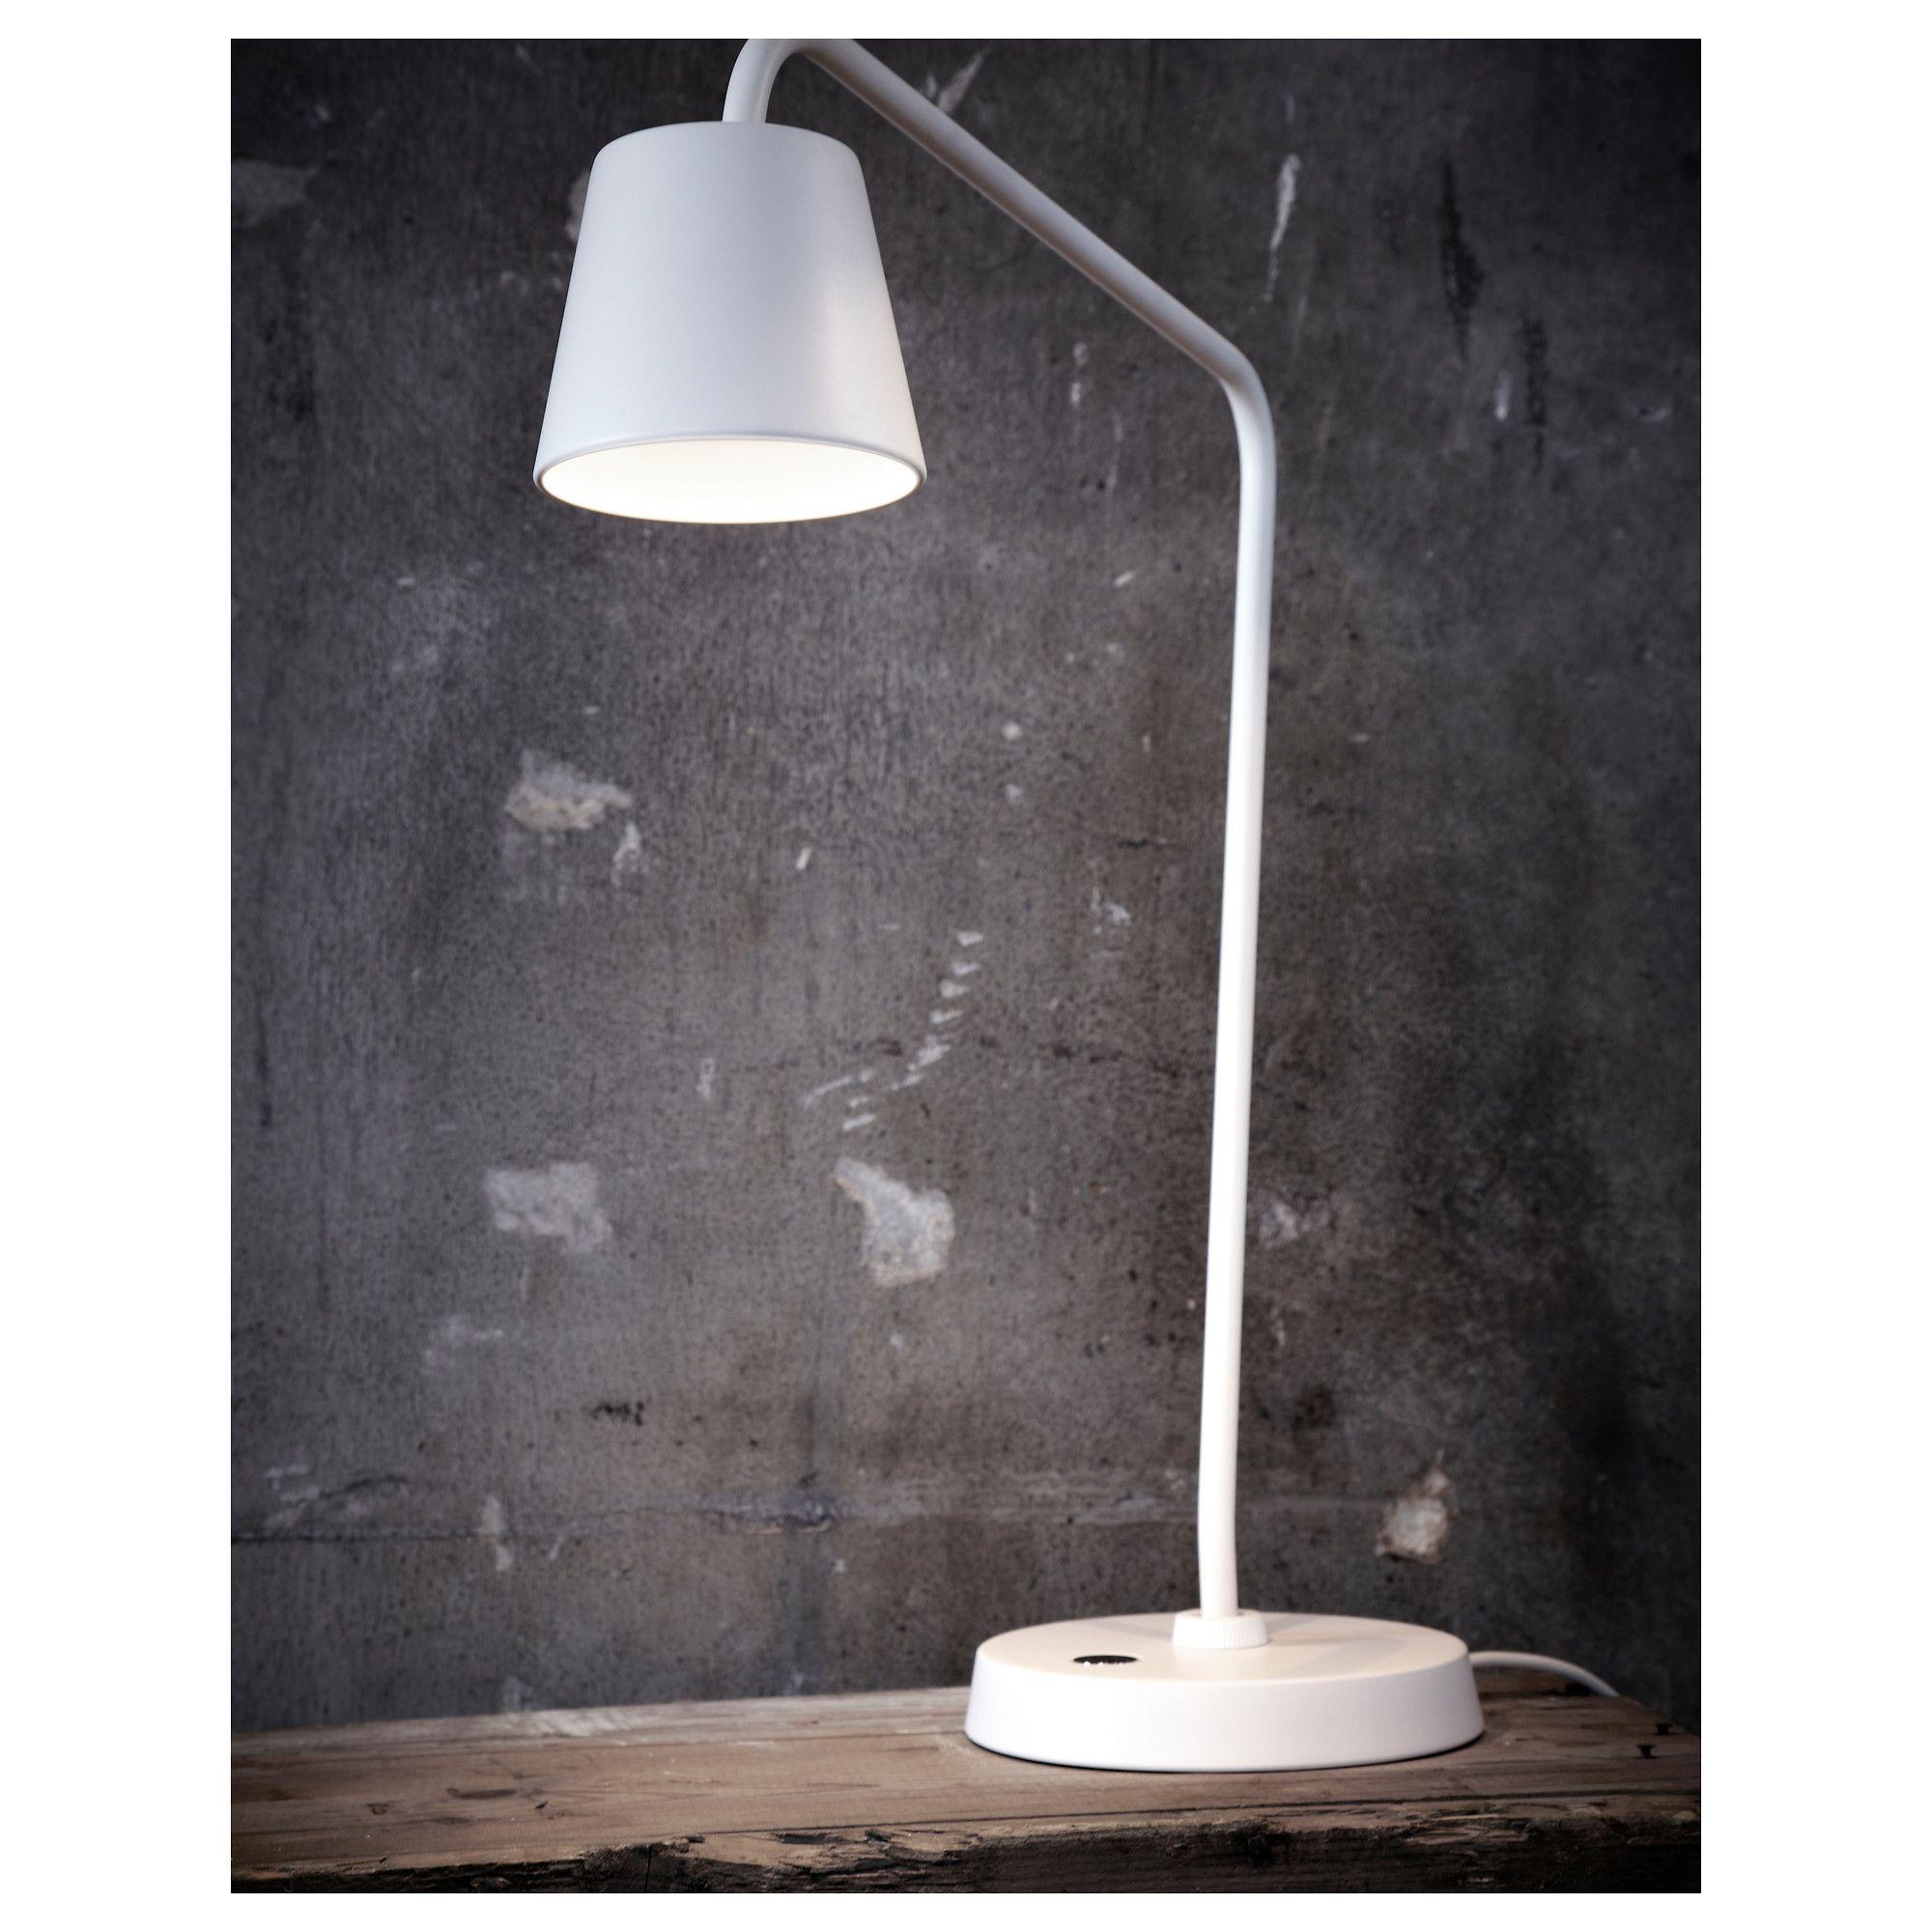 TISDAG Φωτιστικό γραφείου LED IKEA | Lamp, Work lamp, Ikea